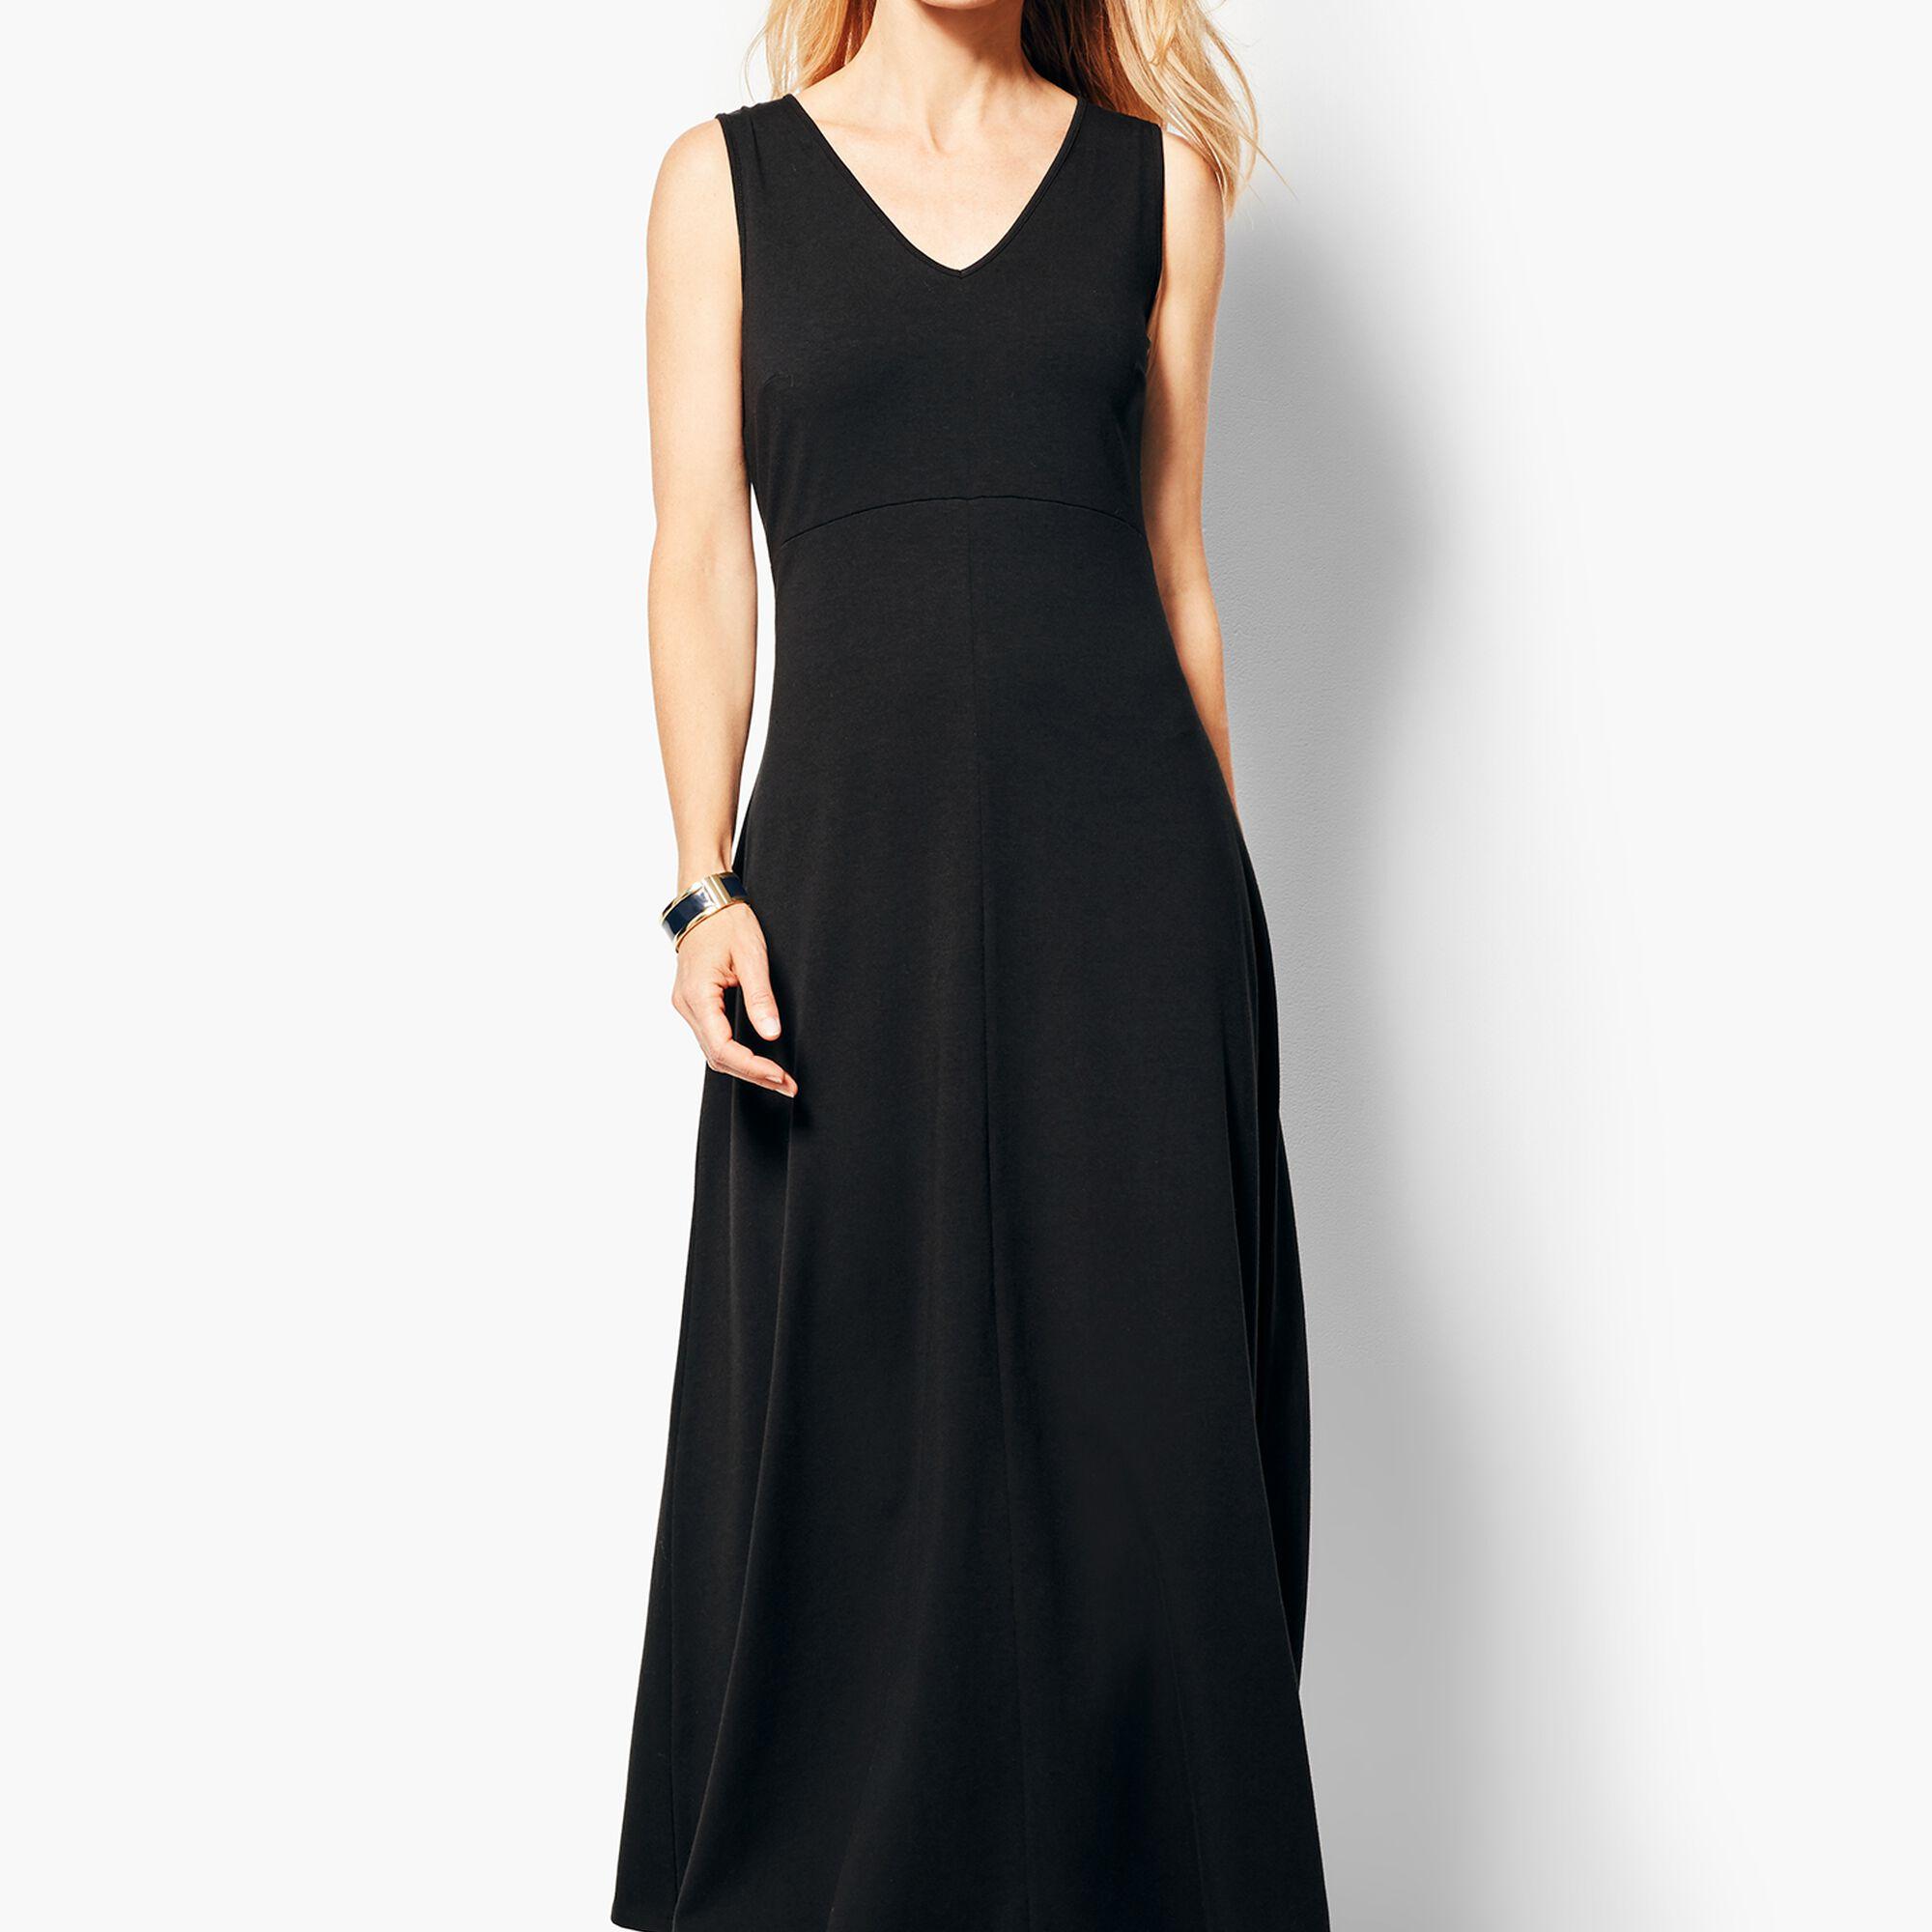 73d6143c94d Images. Casual Jersey Maxi Dress